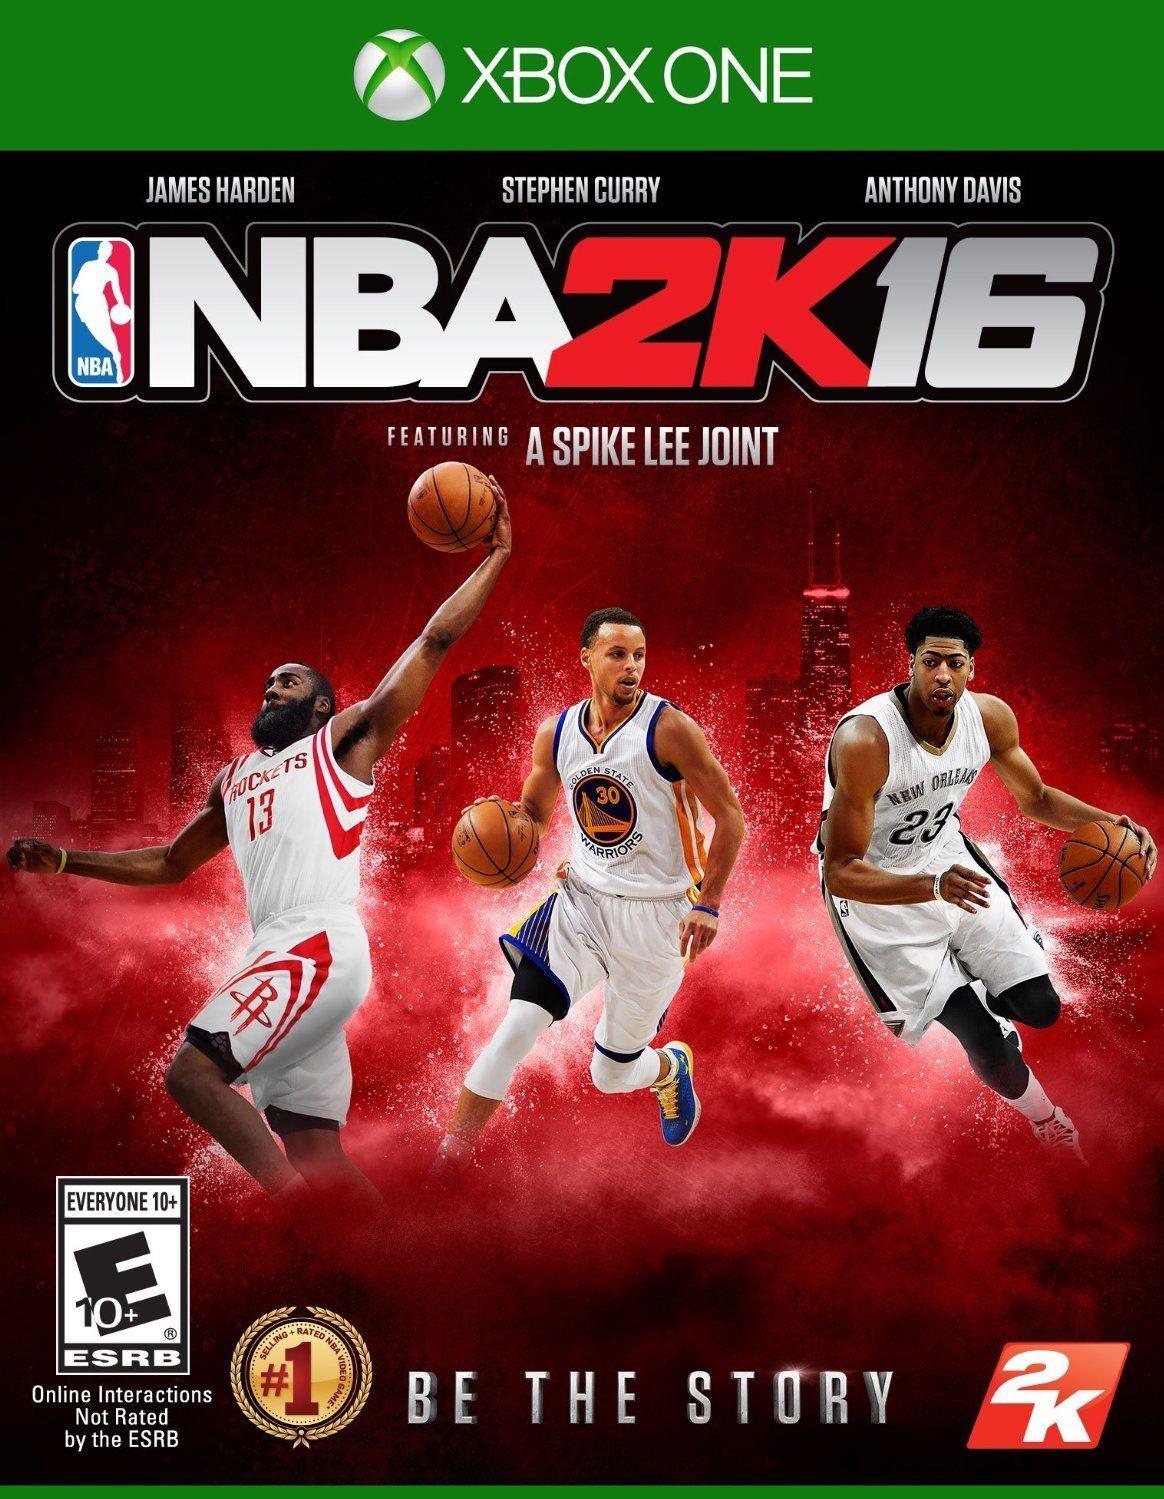 81vQciyANhL. AC SL1500  - NBA 2K16 - Xbox One